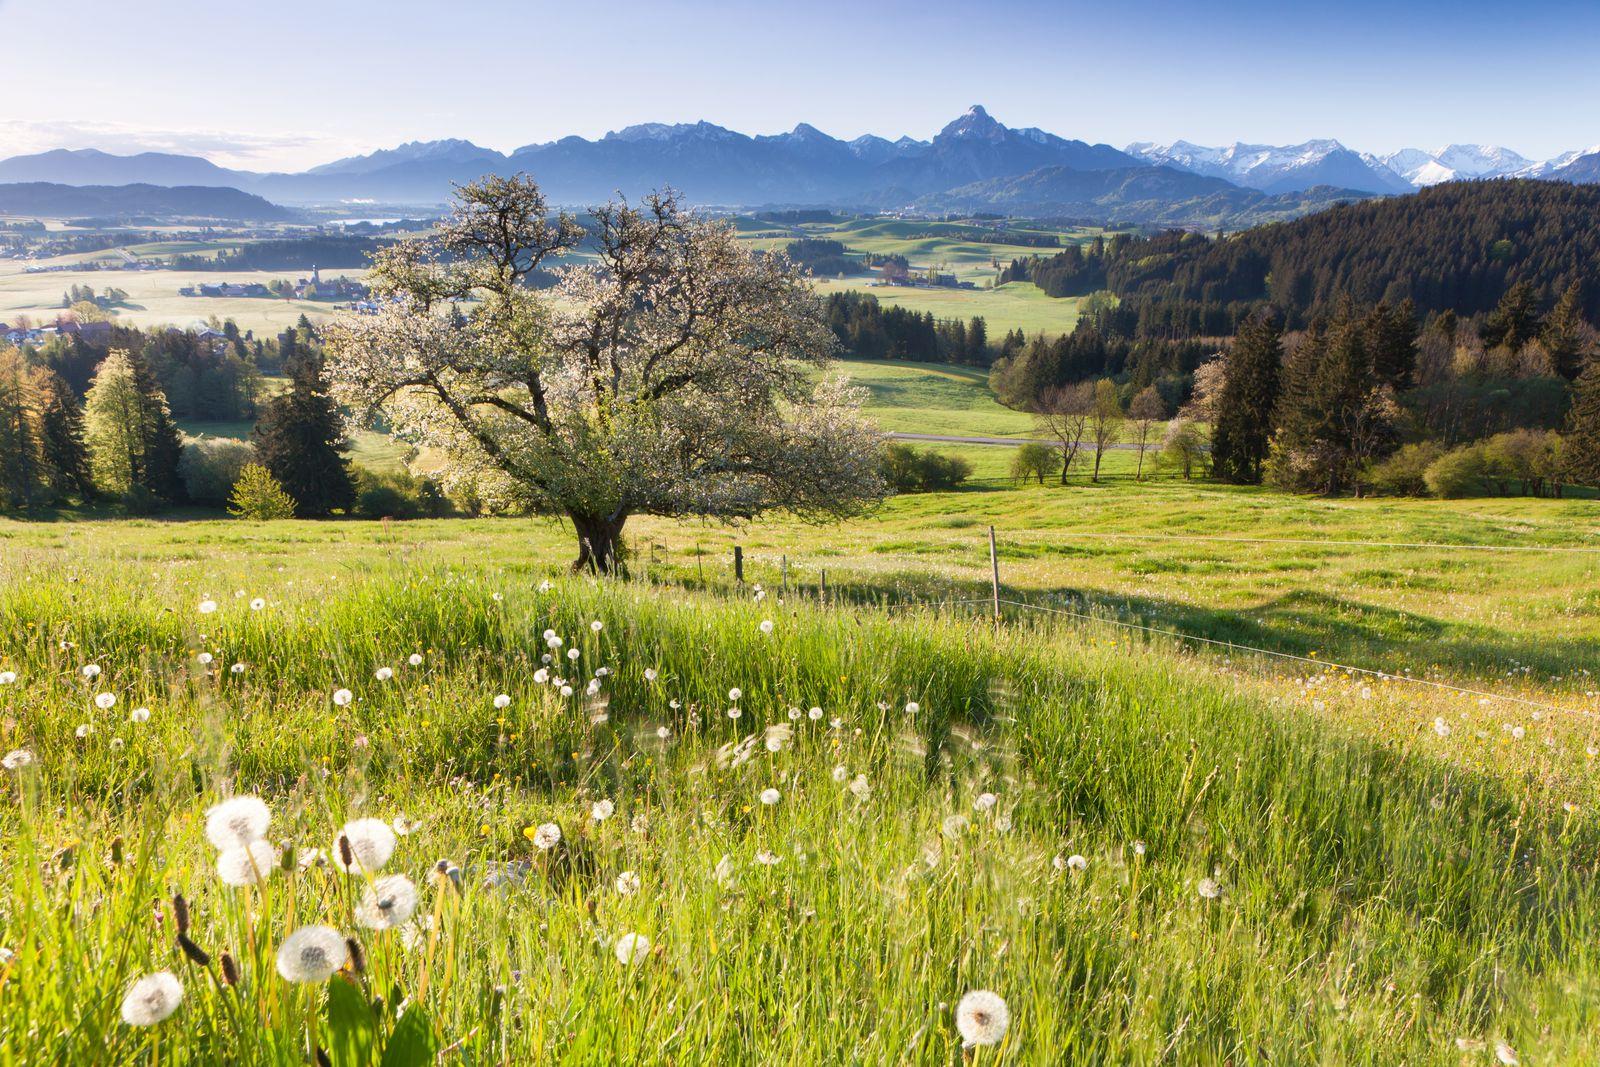 Blooming apple tree in a meadow, Bavaria, Germany